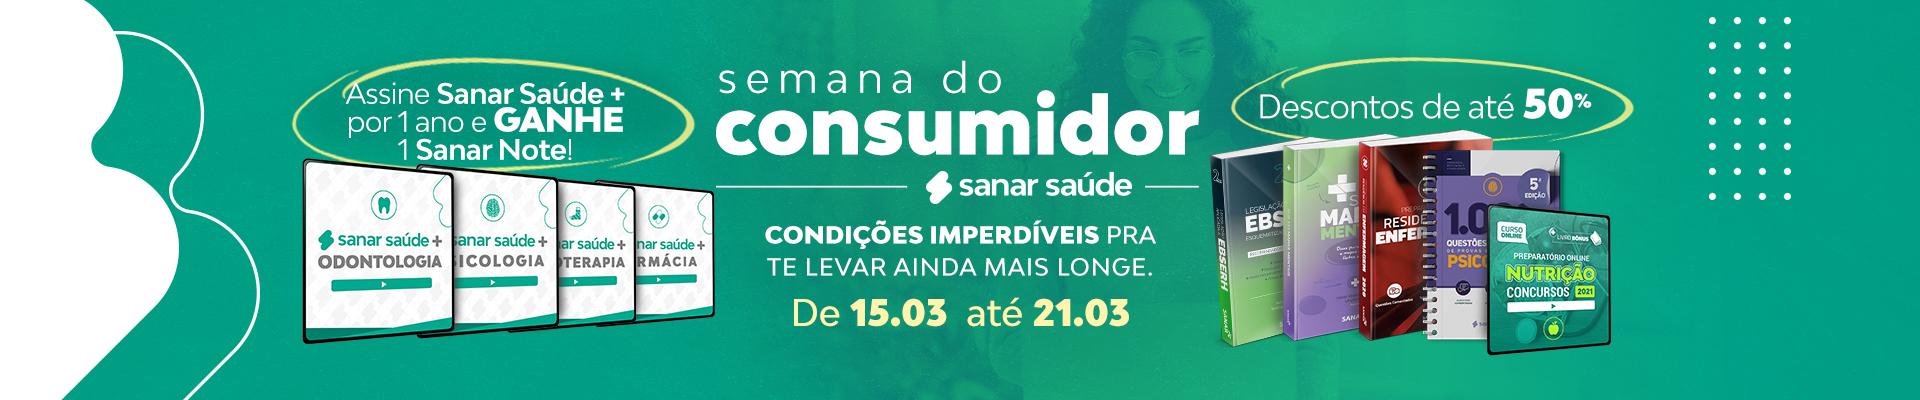 Semana do Consumidor Sanar Saúde 2021